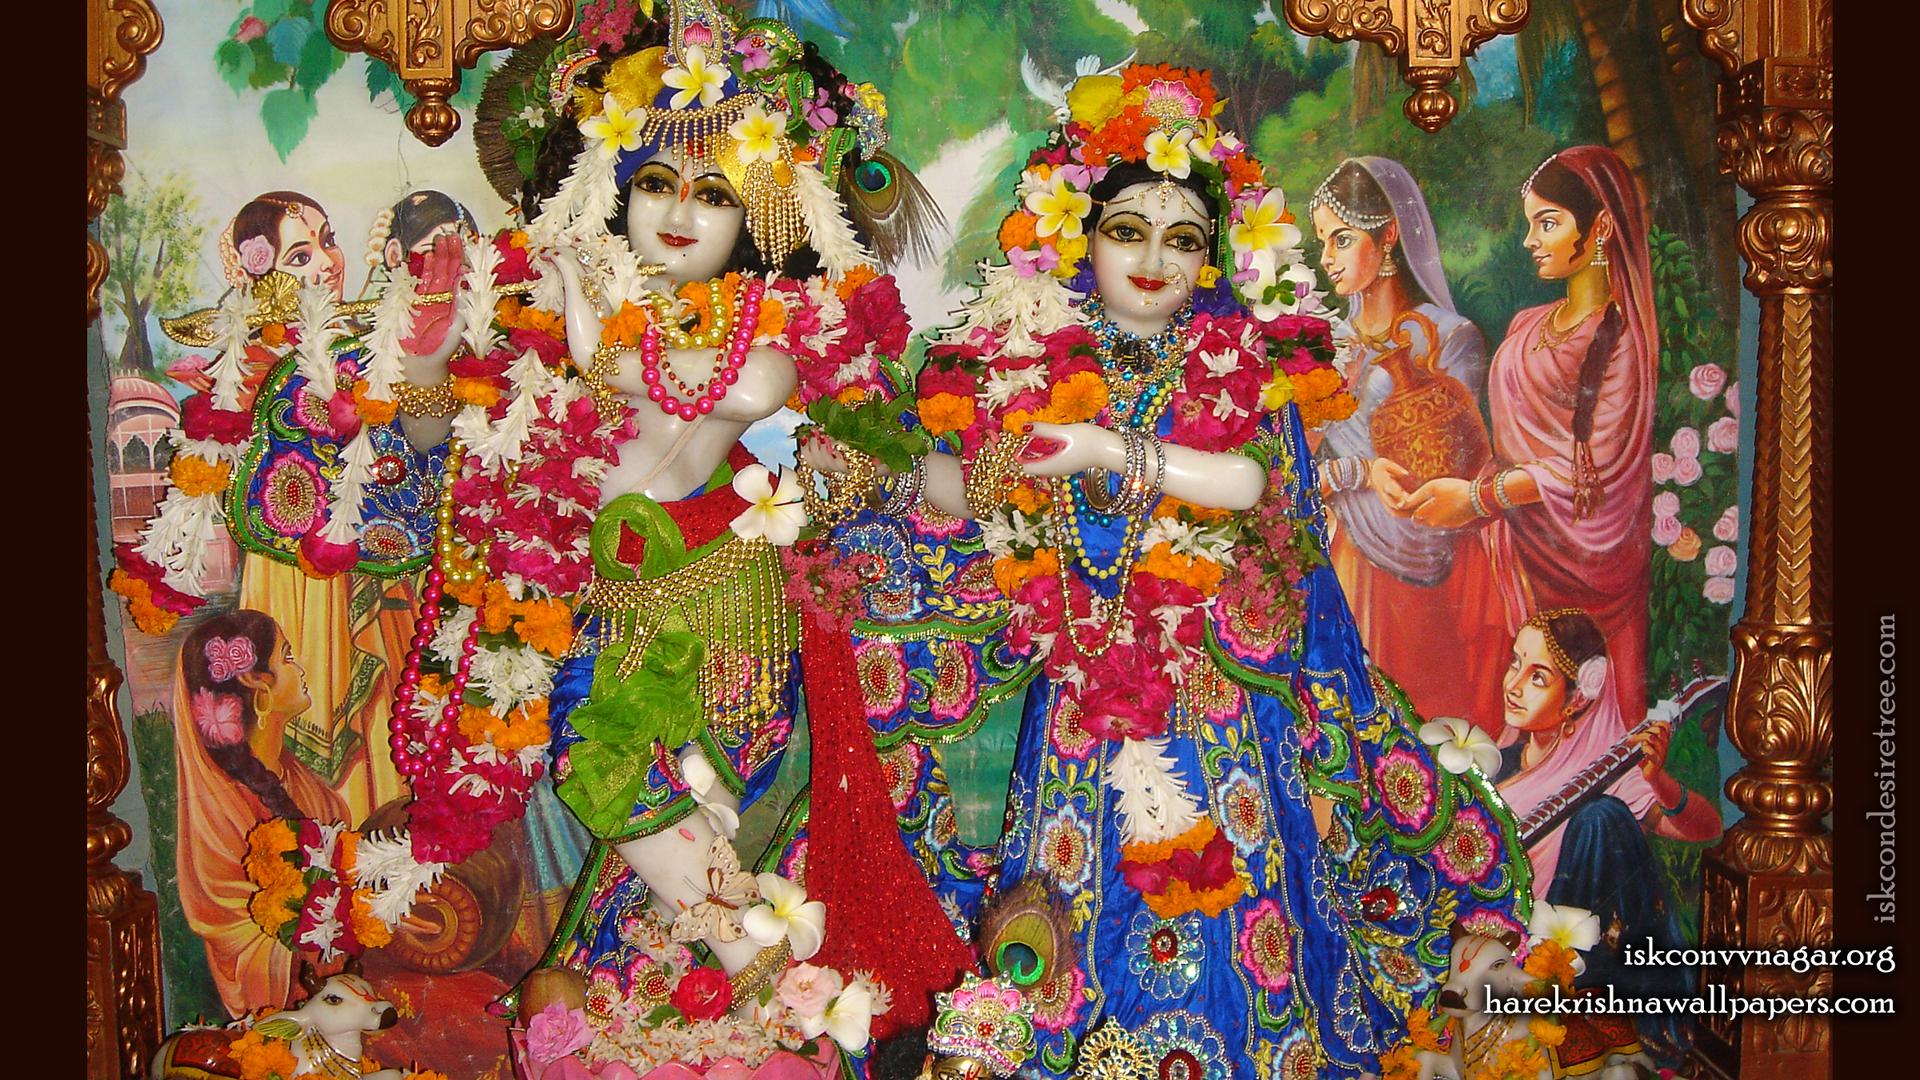 Sri Sri Radha Giridhari Wallpaper (026) Size 1920x1080 Download